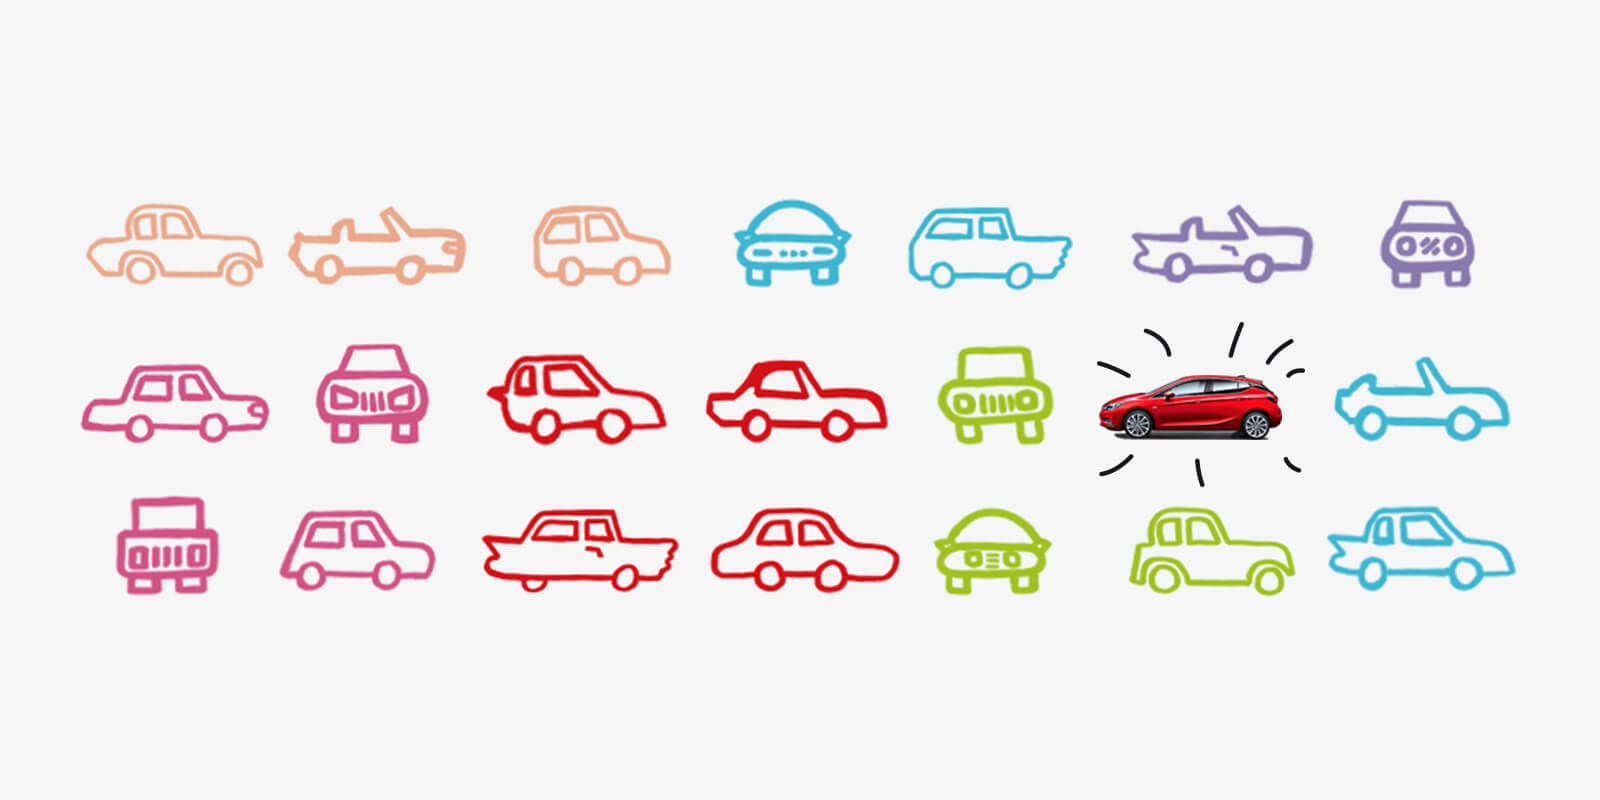 Coc Papiere Wichtig Bei Kfz Import Und Auto Export Autowelt